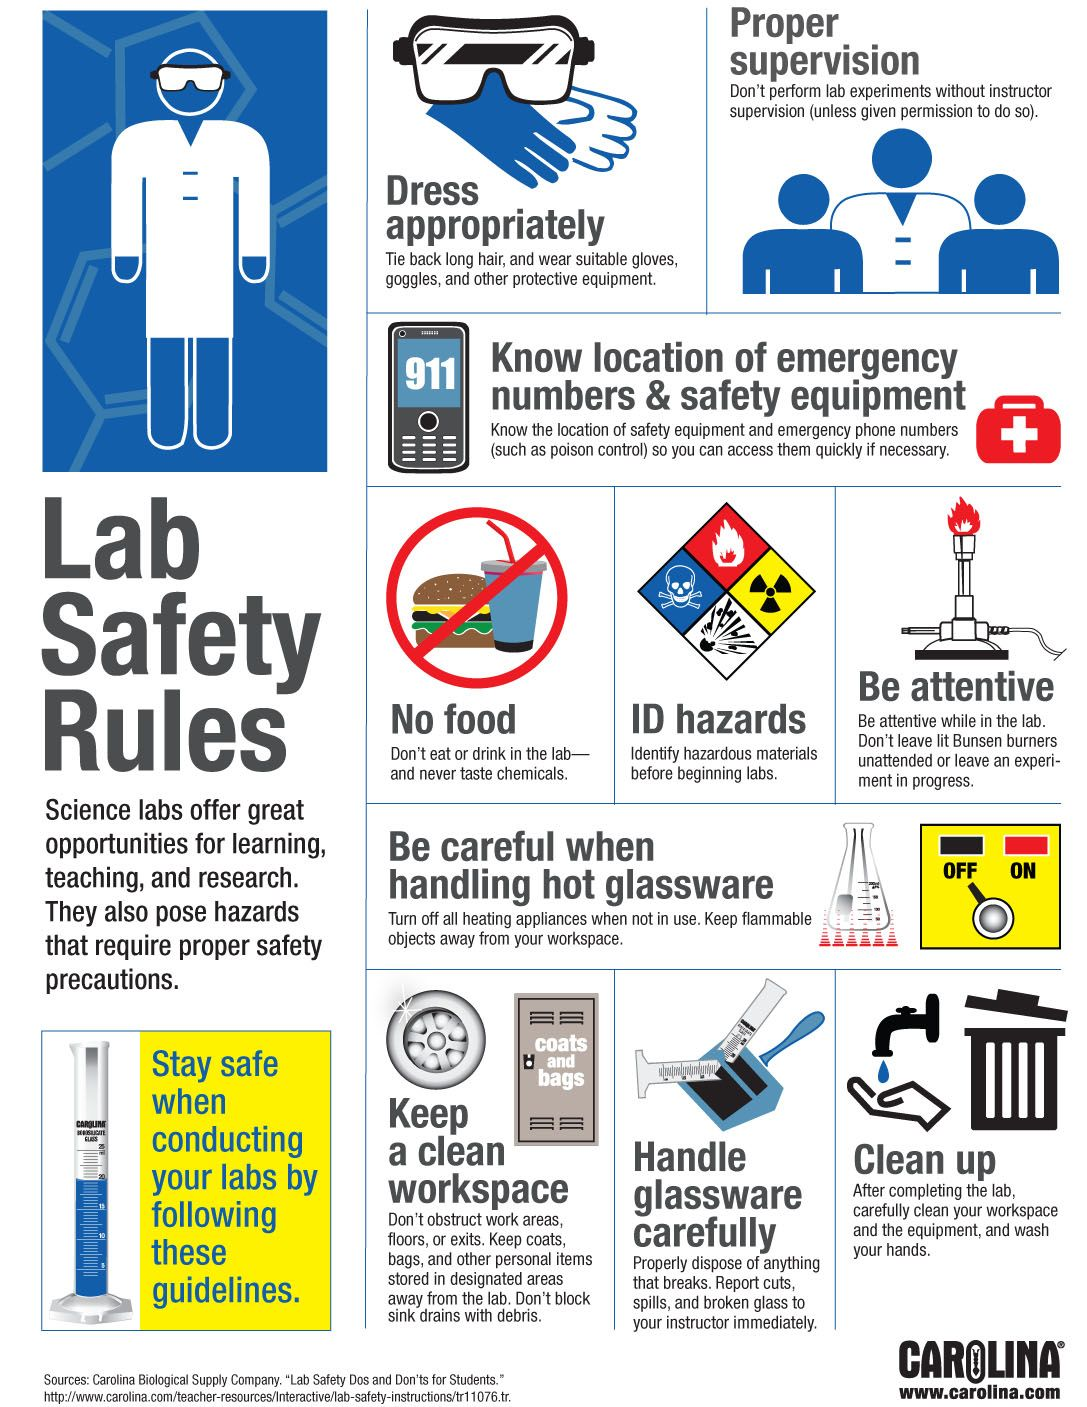 Lab Safety Riles